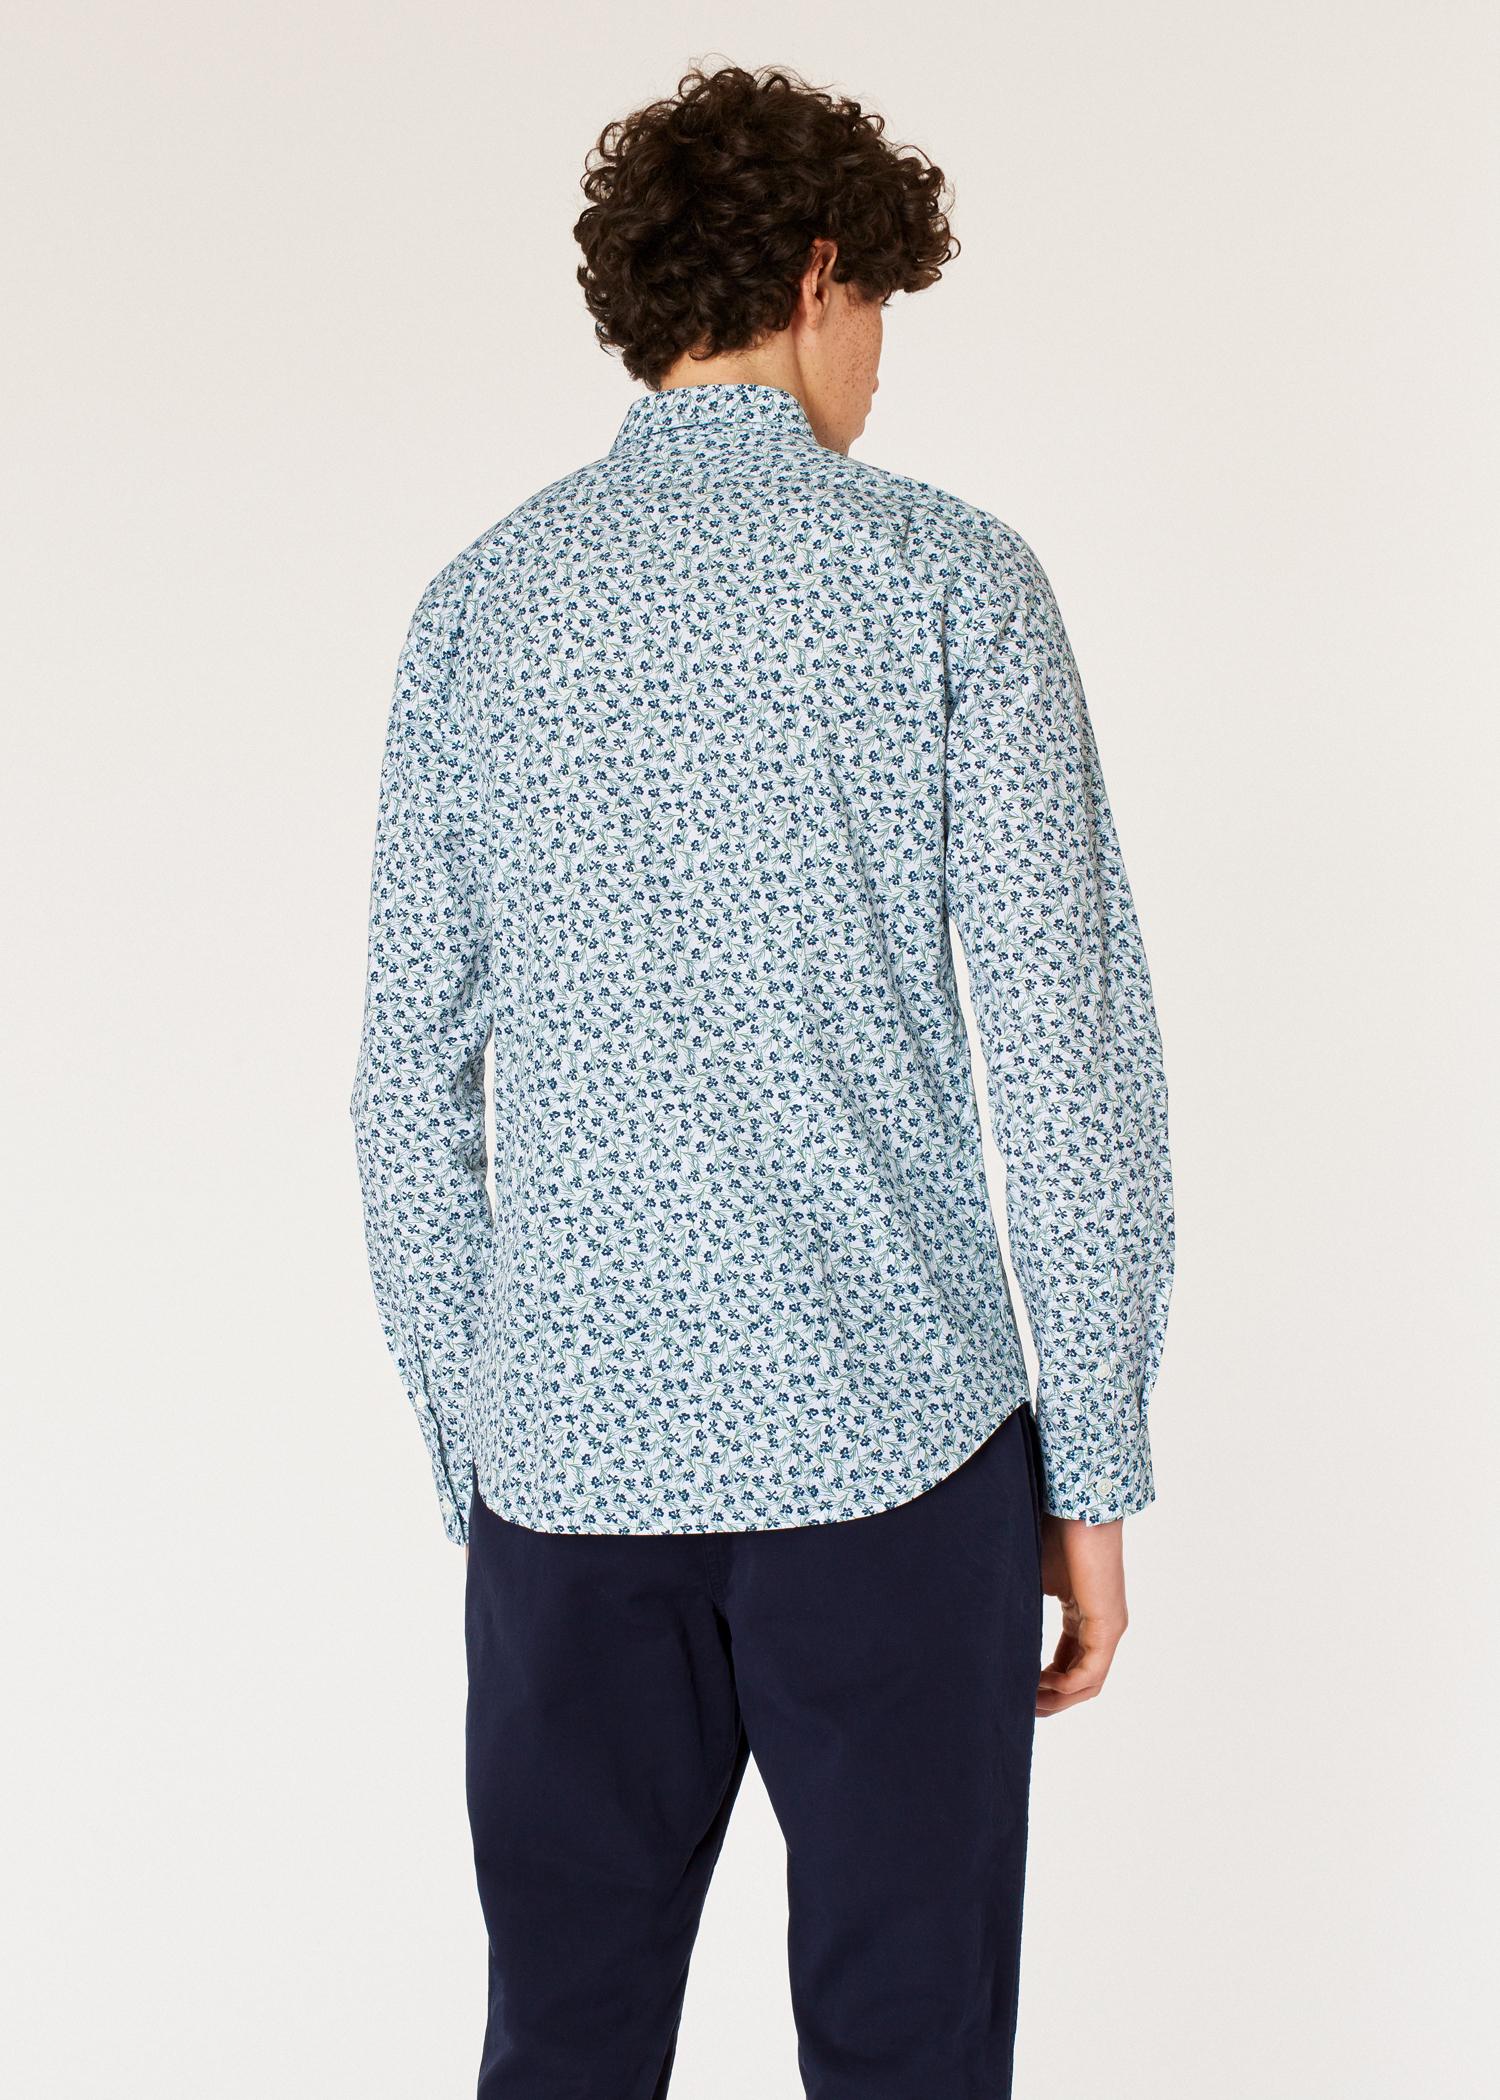 acf0f00d3f Men's Slim-Fit White 'Mini Cypress' Print Cotton Shirt - Paul Smith Asia